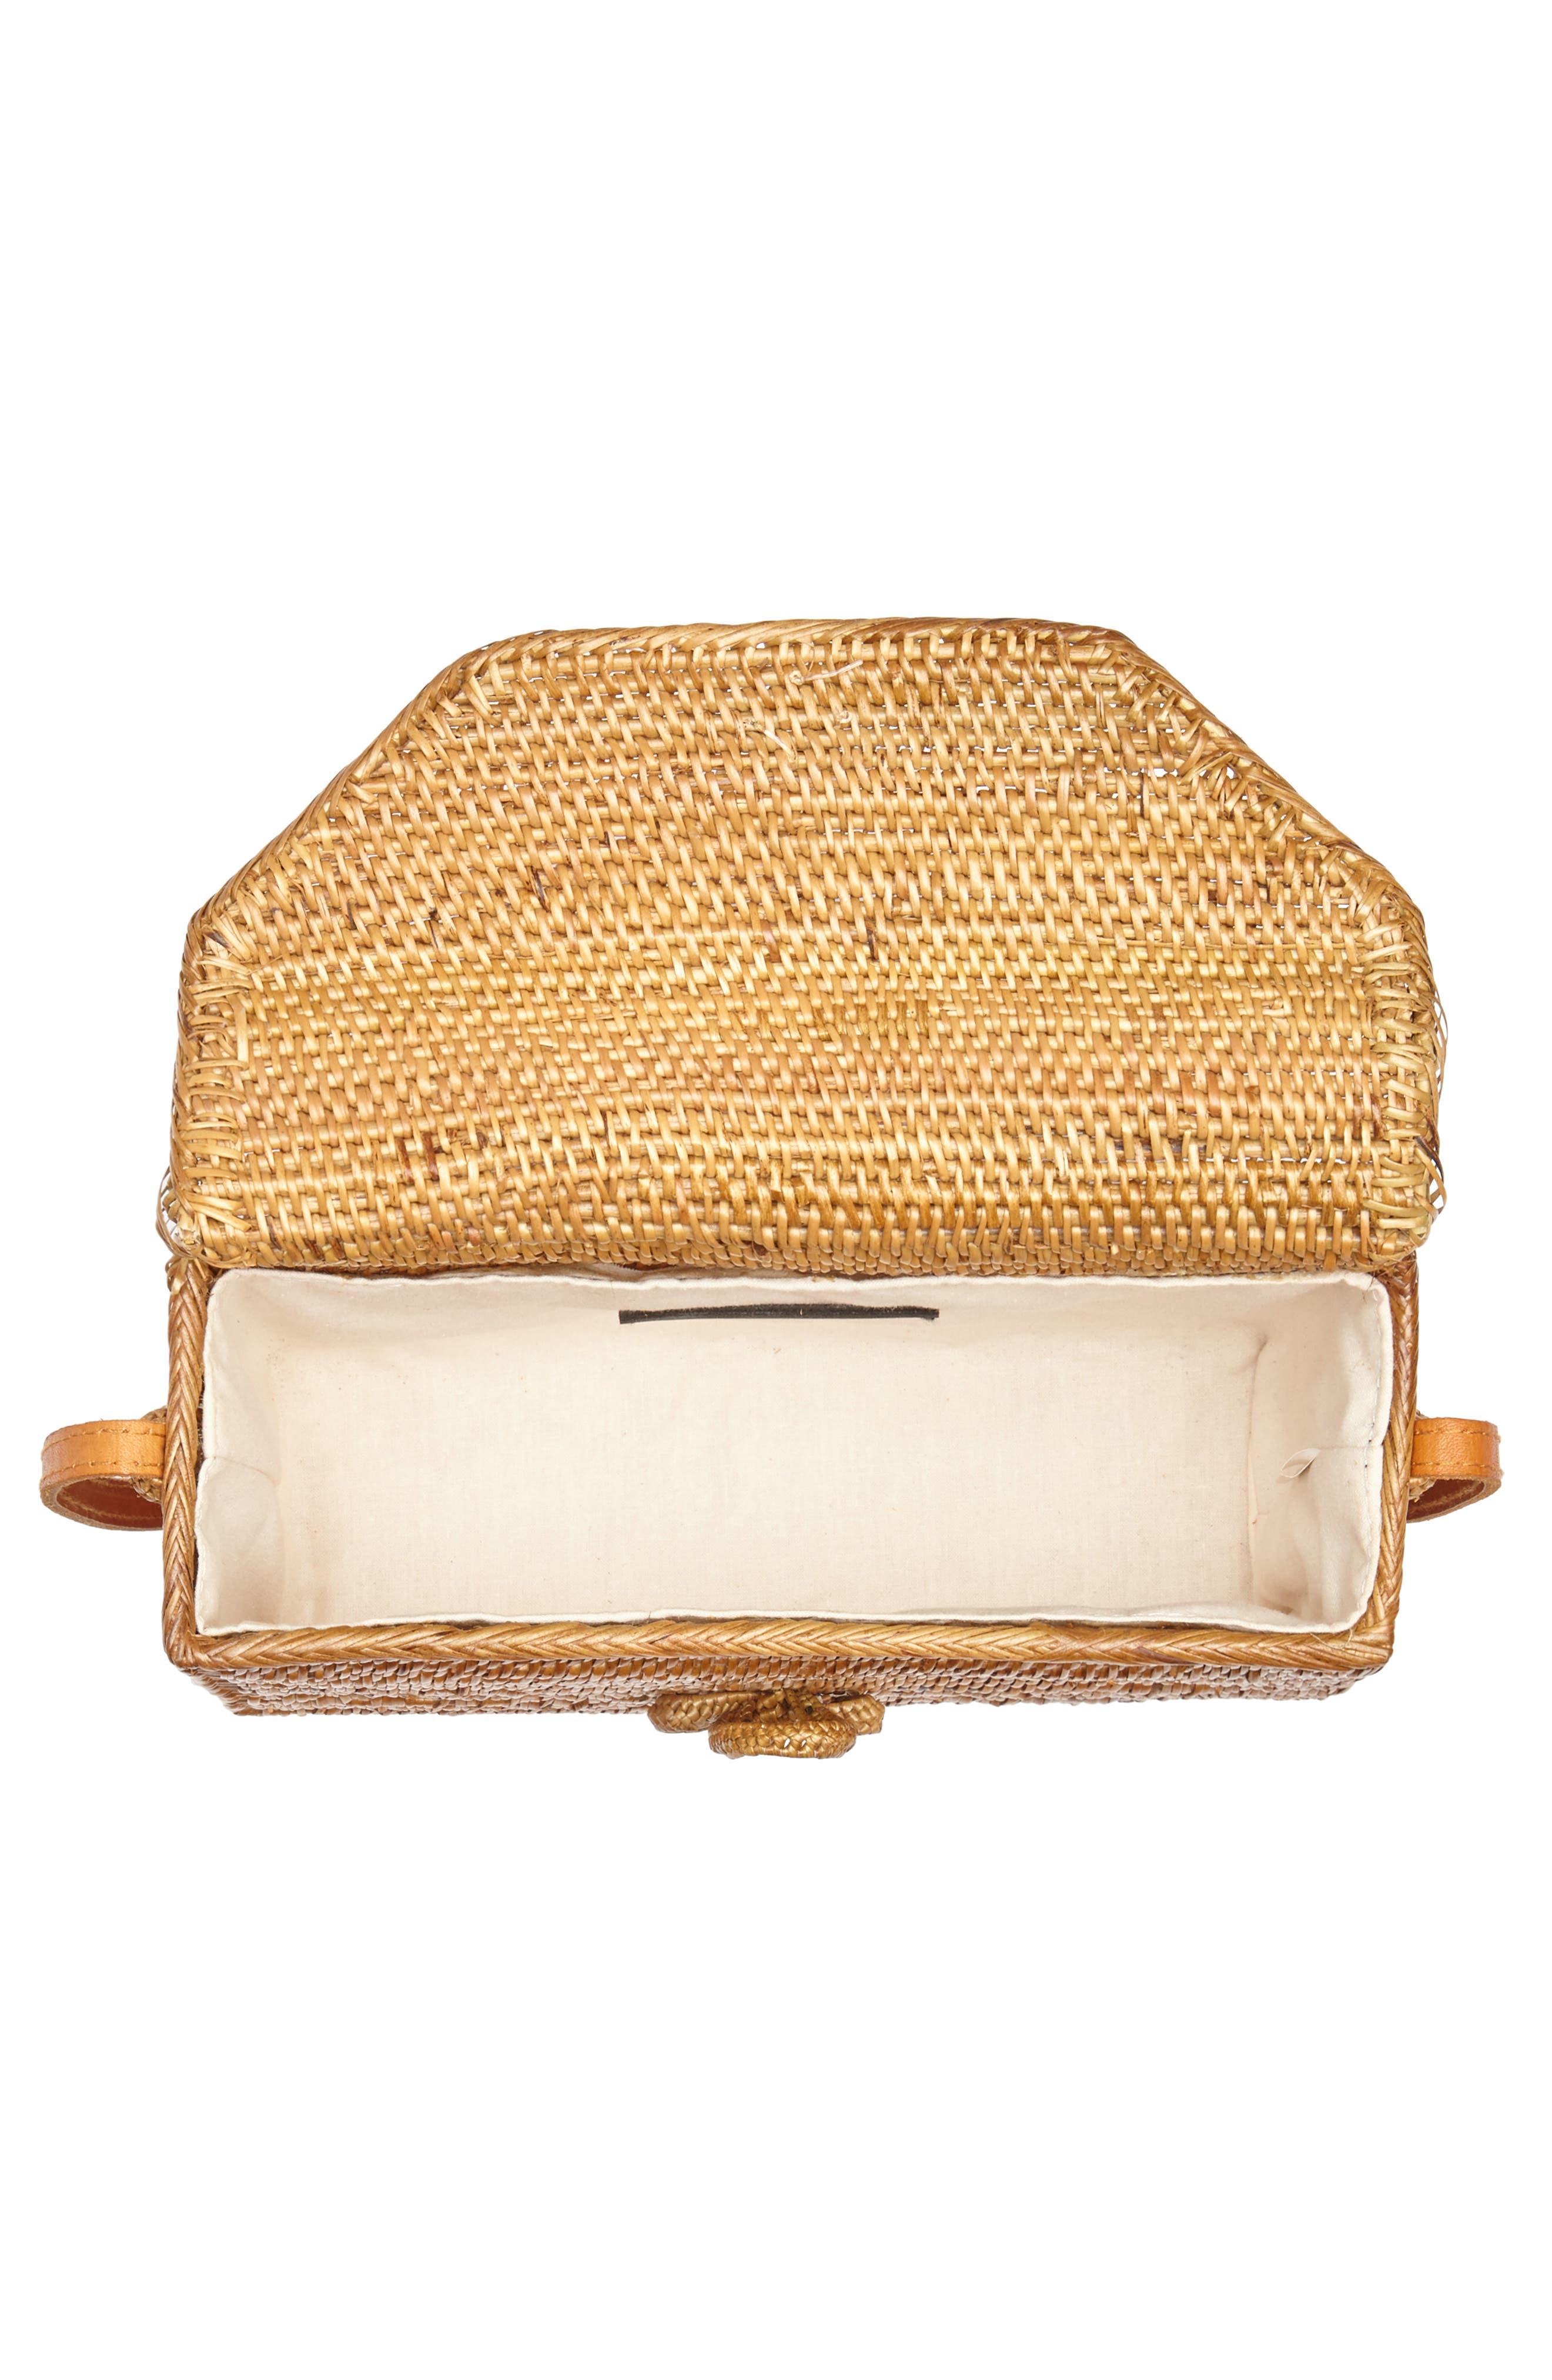 Woven Rattan Box Crossbody Bag,                             Alternate thumbnail 4, color,                             Tan